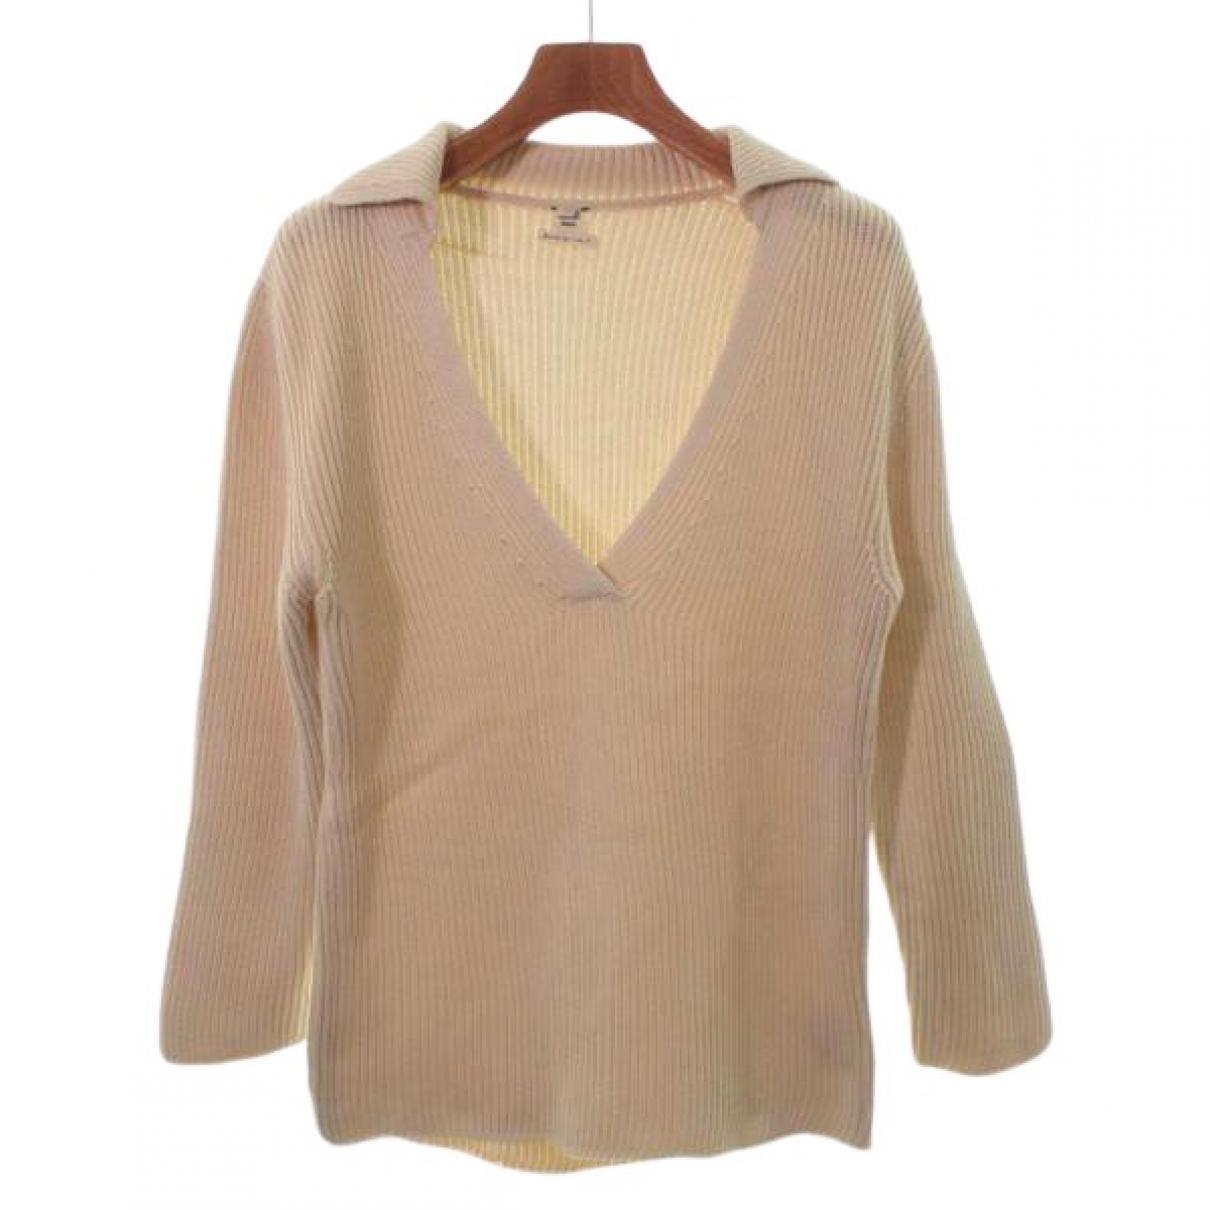 Hermes - Pull   pour femme en soie - beige